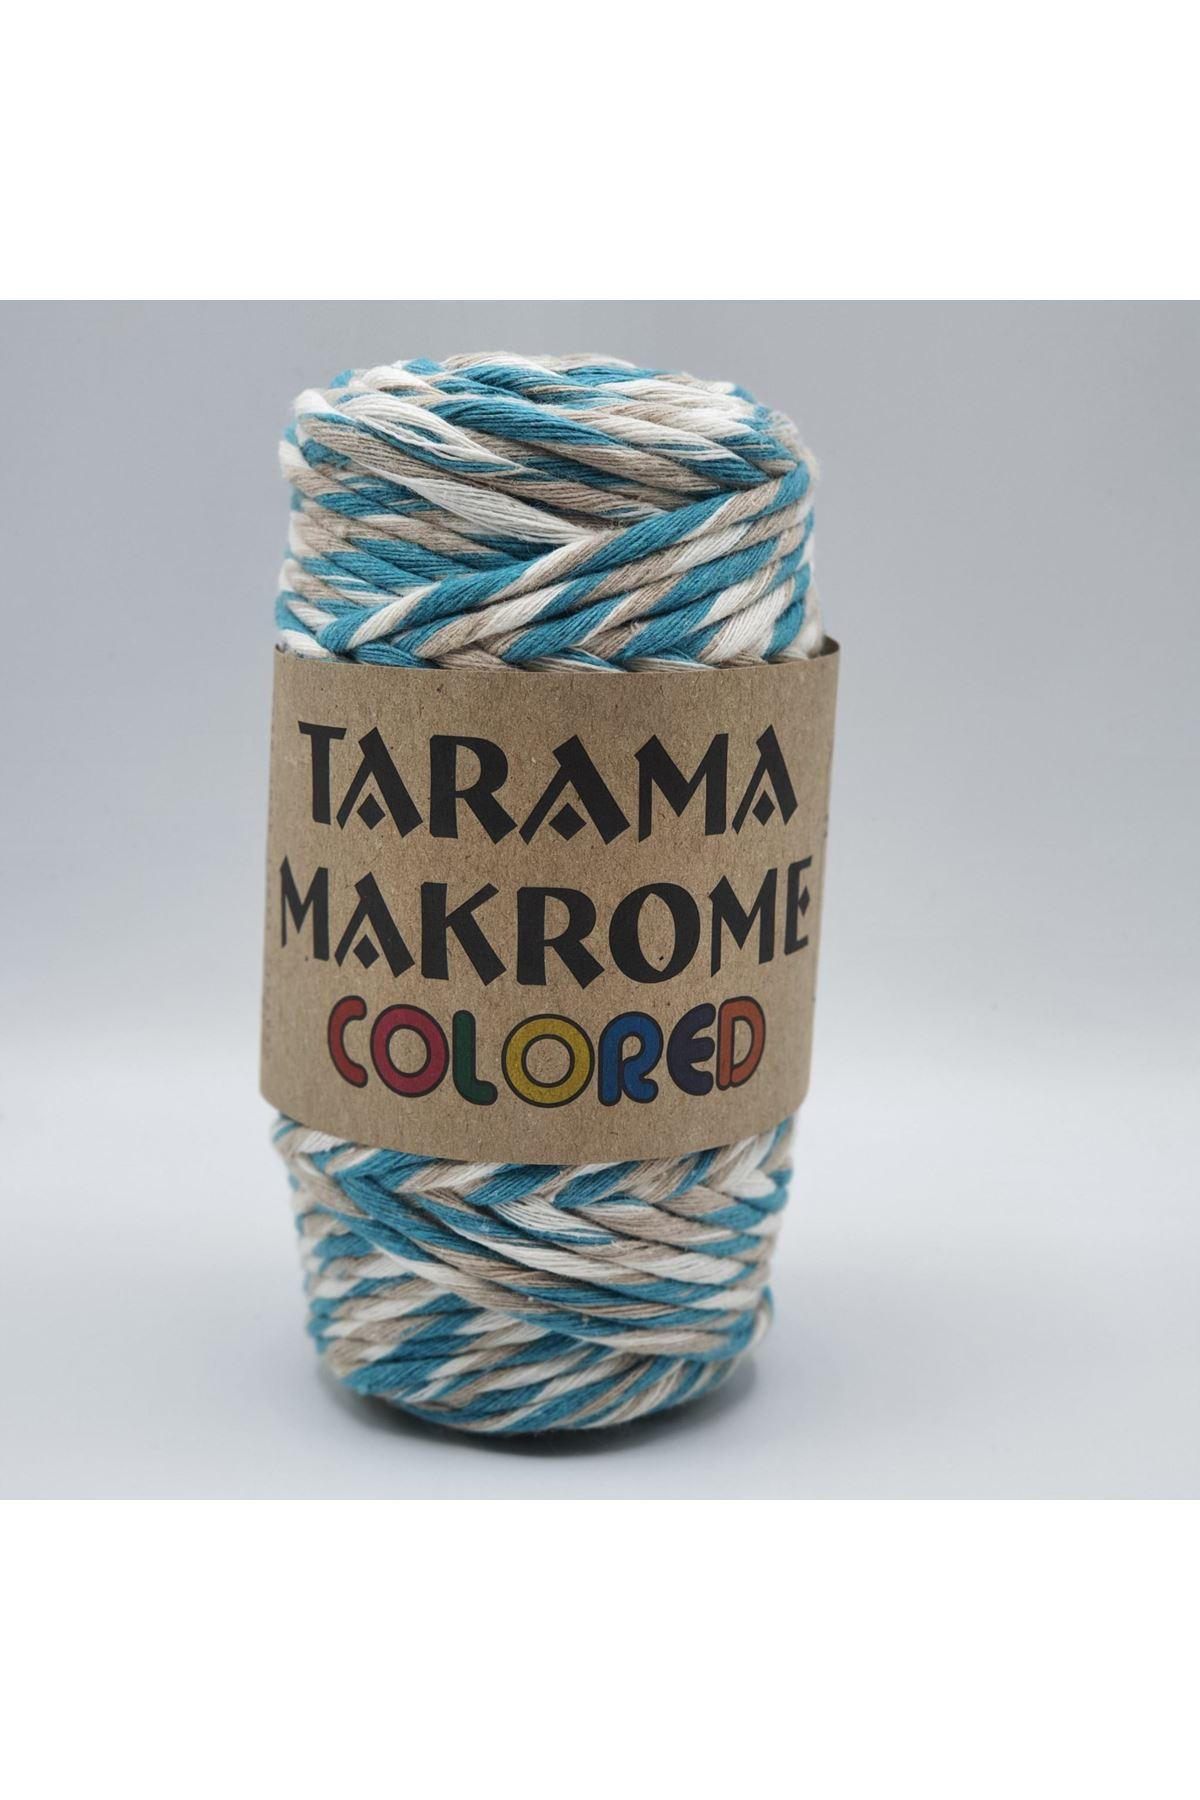 Tarama Makrome Colored 5 mm - 05